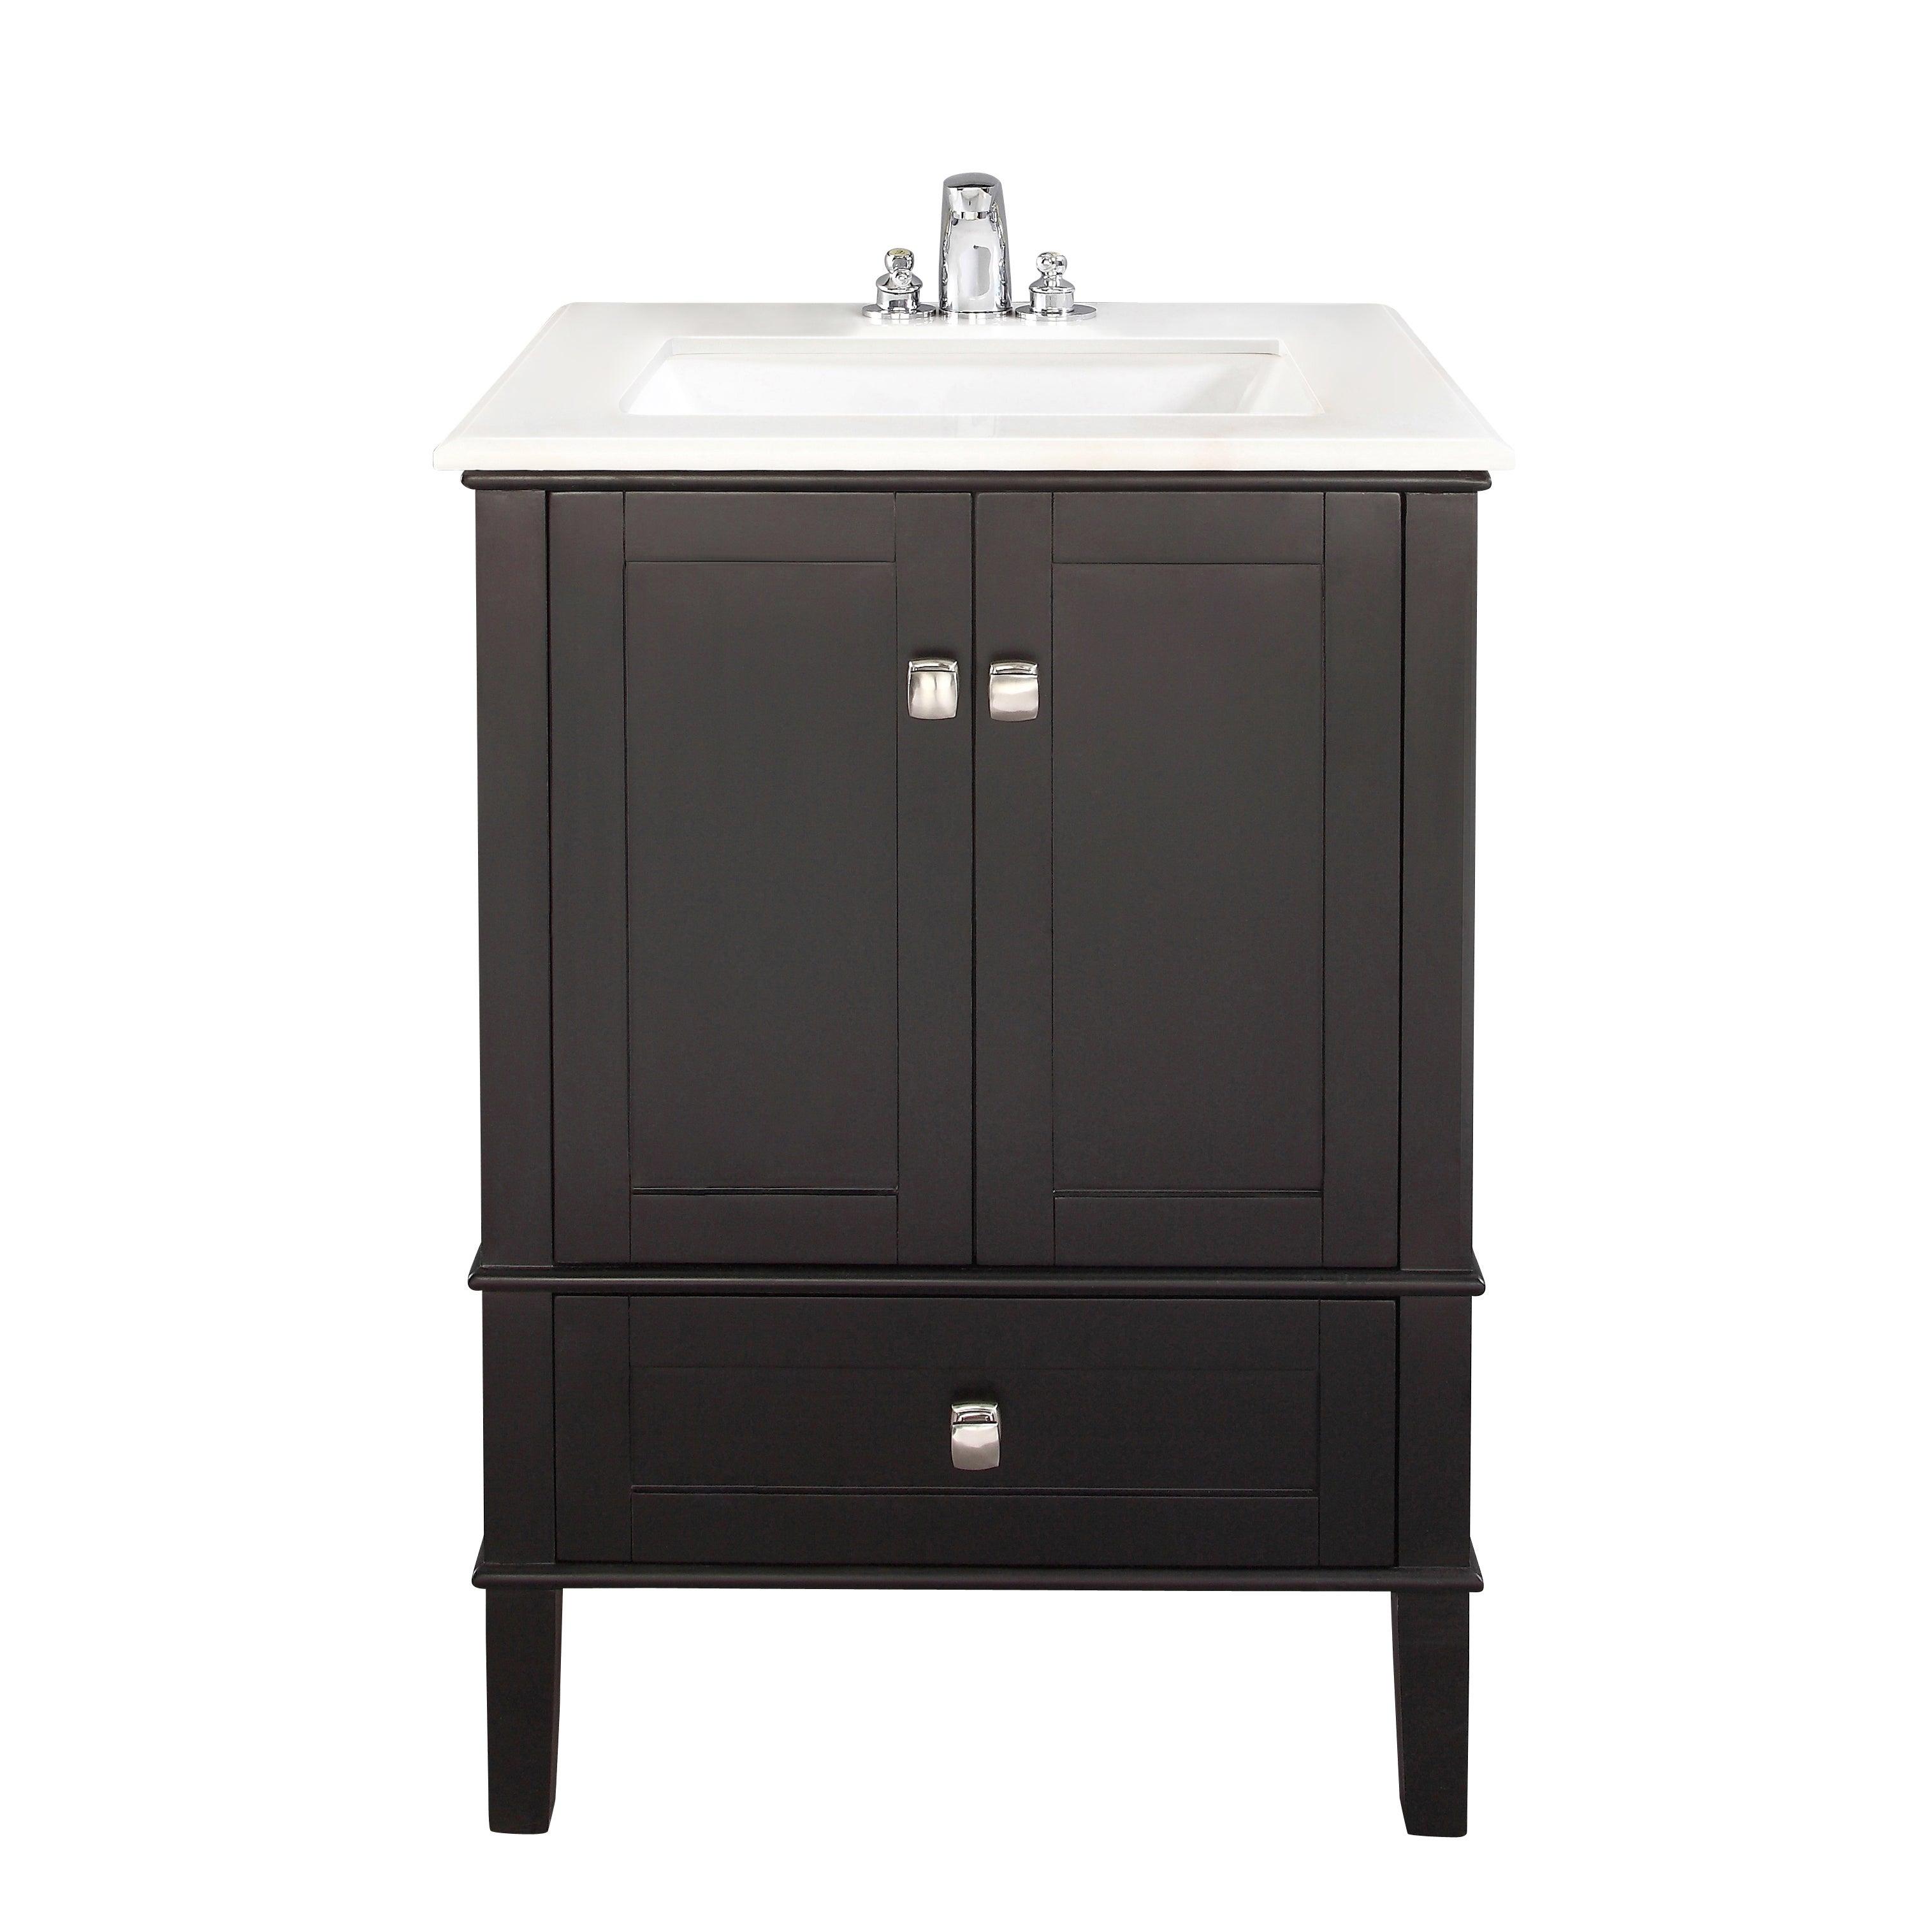 Shop WYNDENHALL Windham Black Door Inch Bath Vanity Set With - 24 inch black bathroom vanity